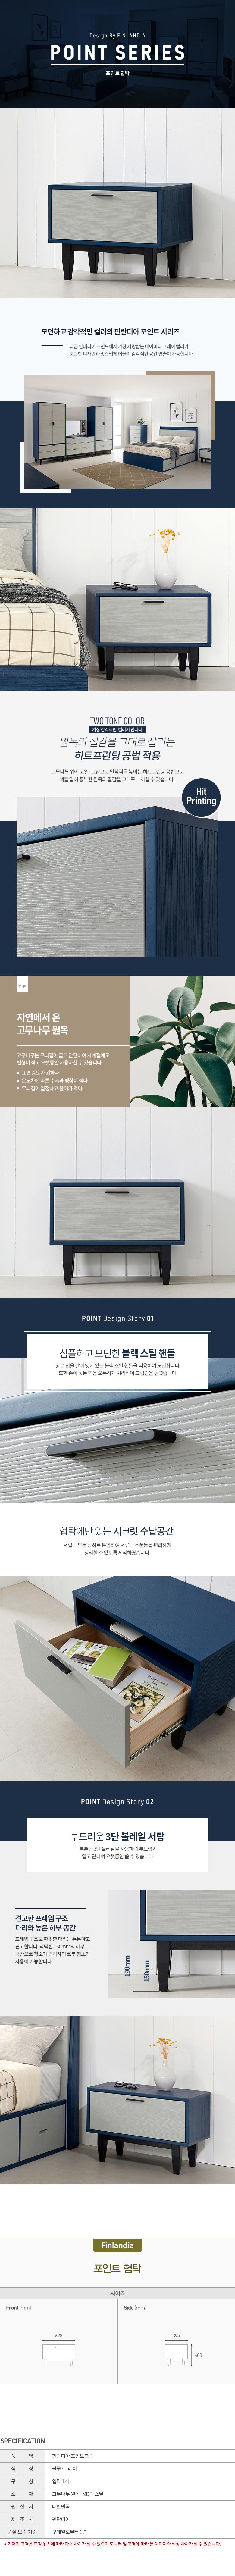 point_nighttable.jpg